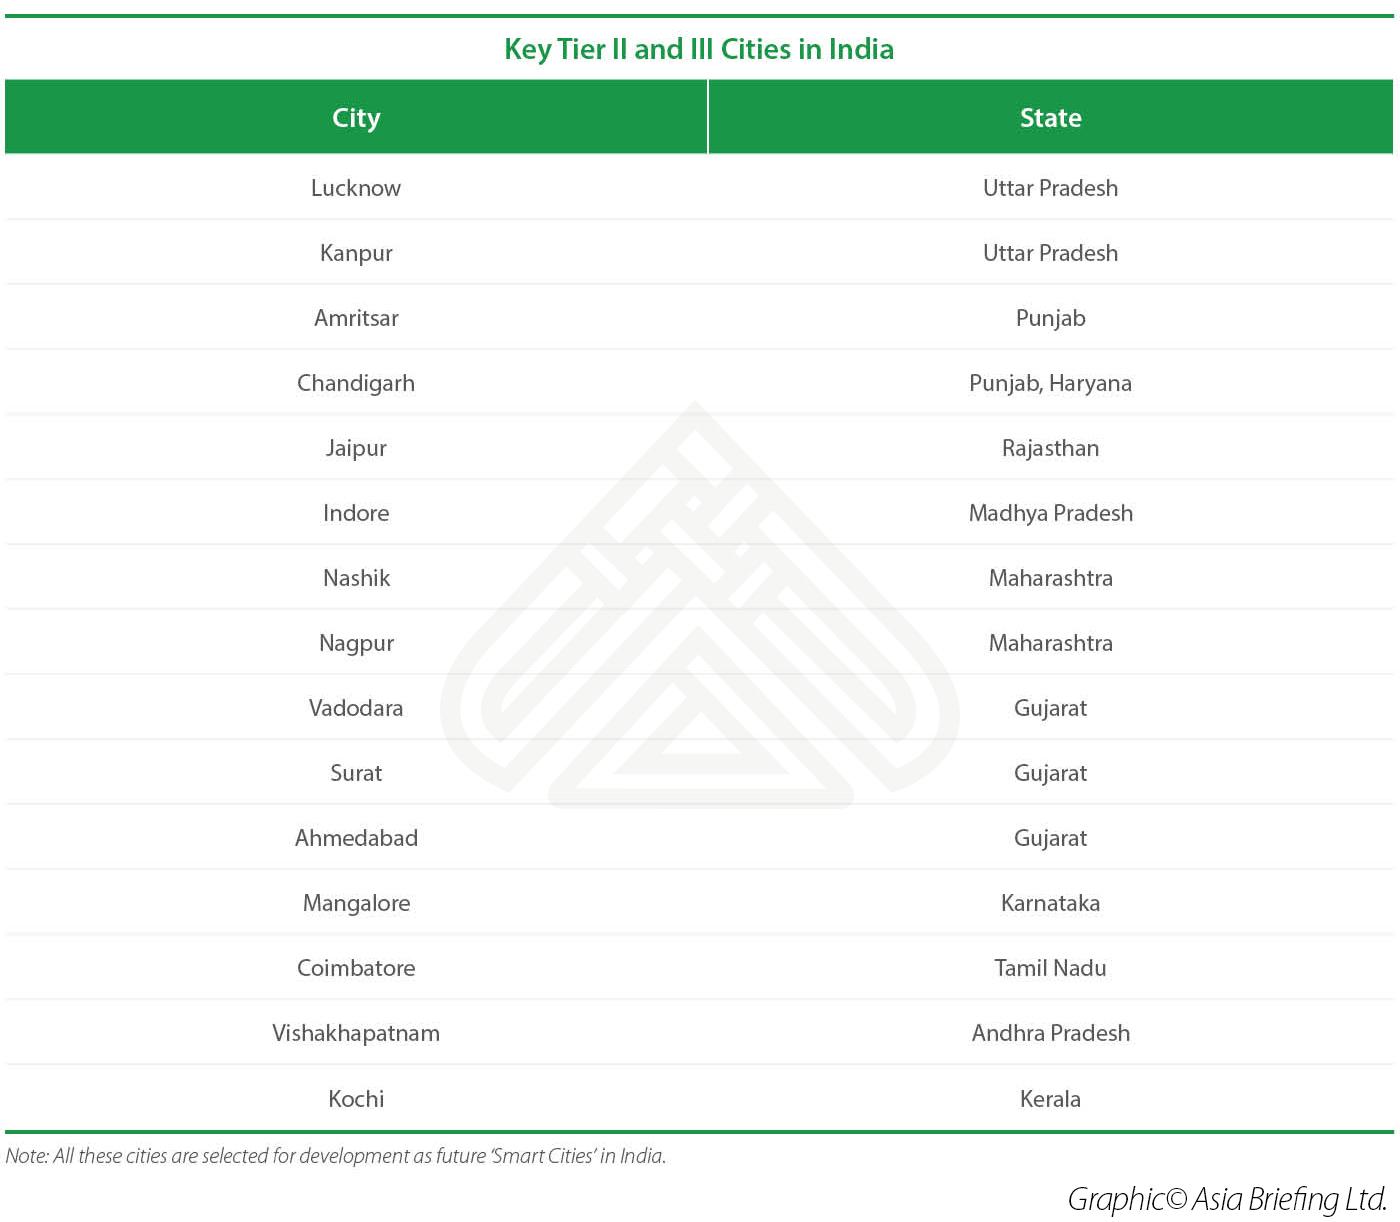 India Tier 2 and Tier 3 Smart Cities